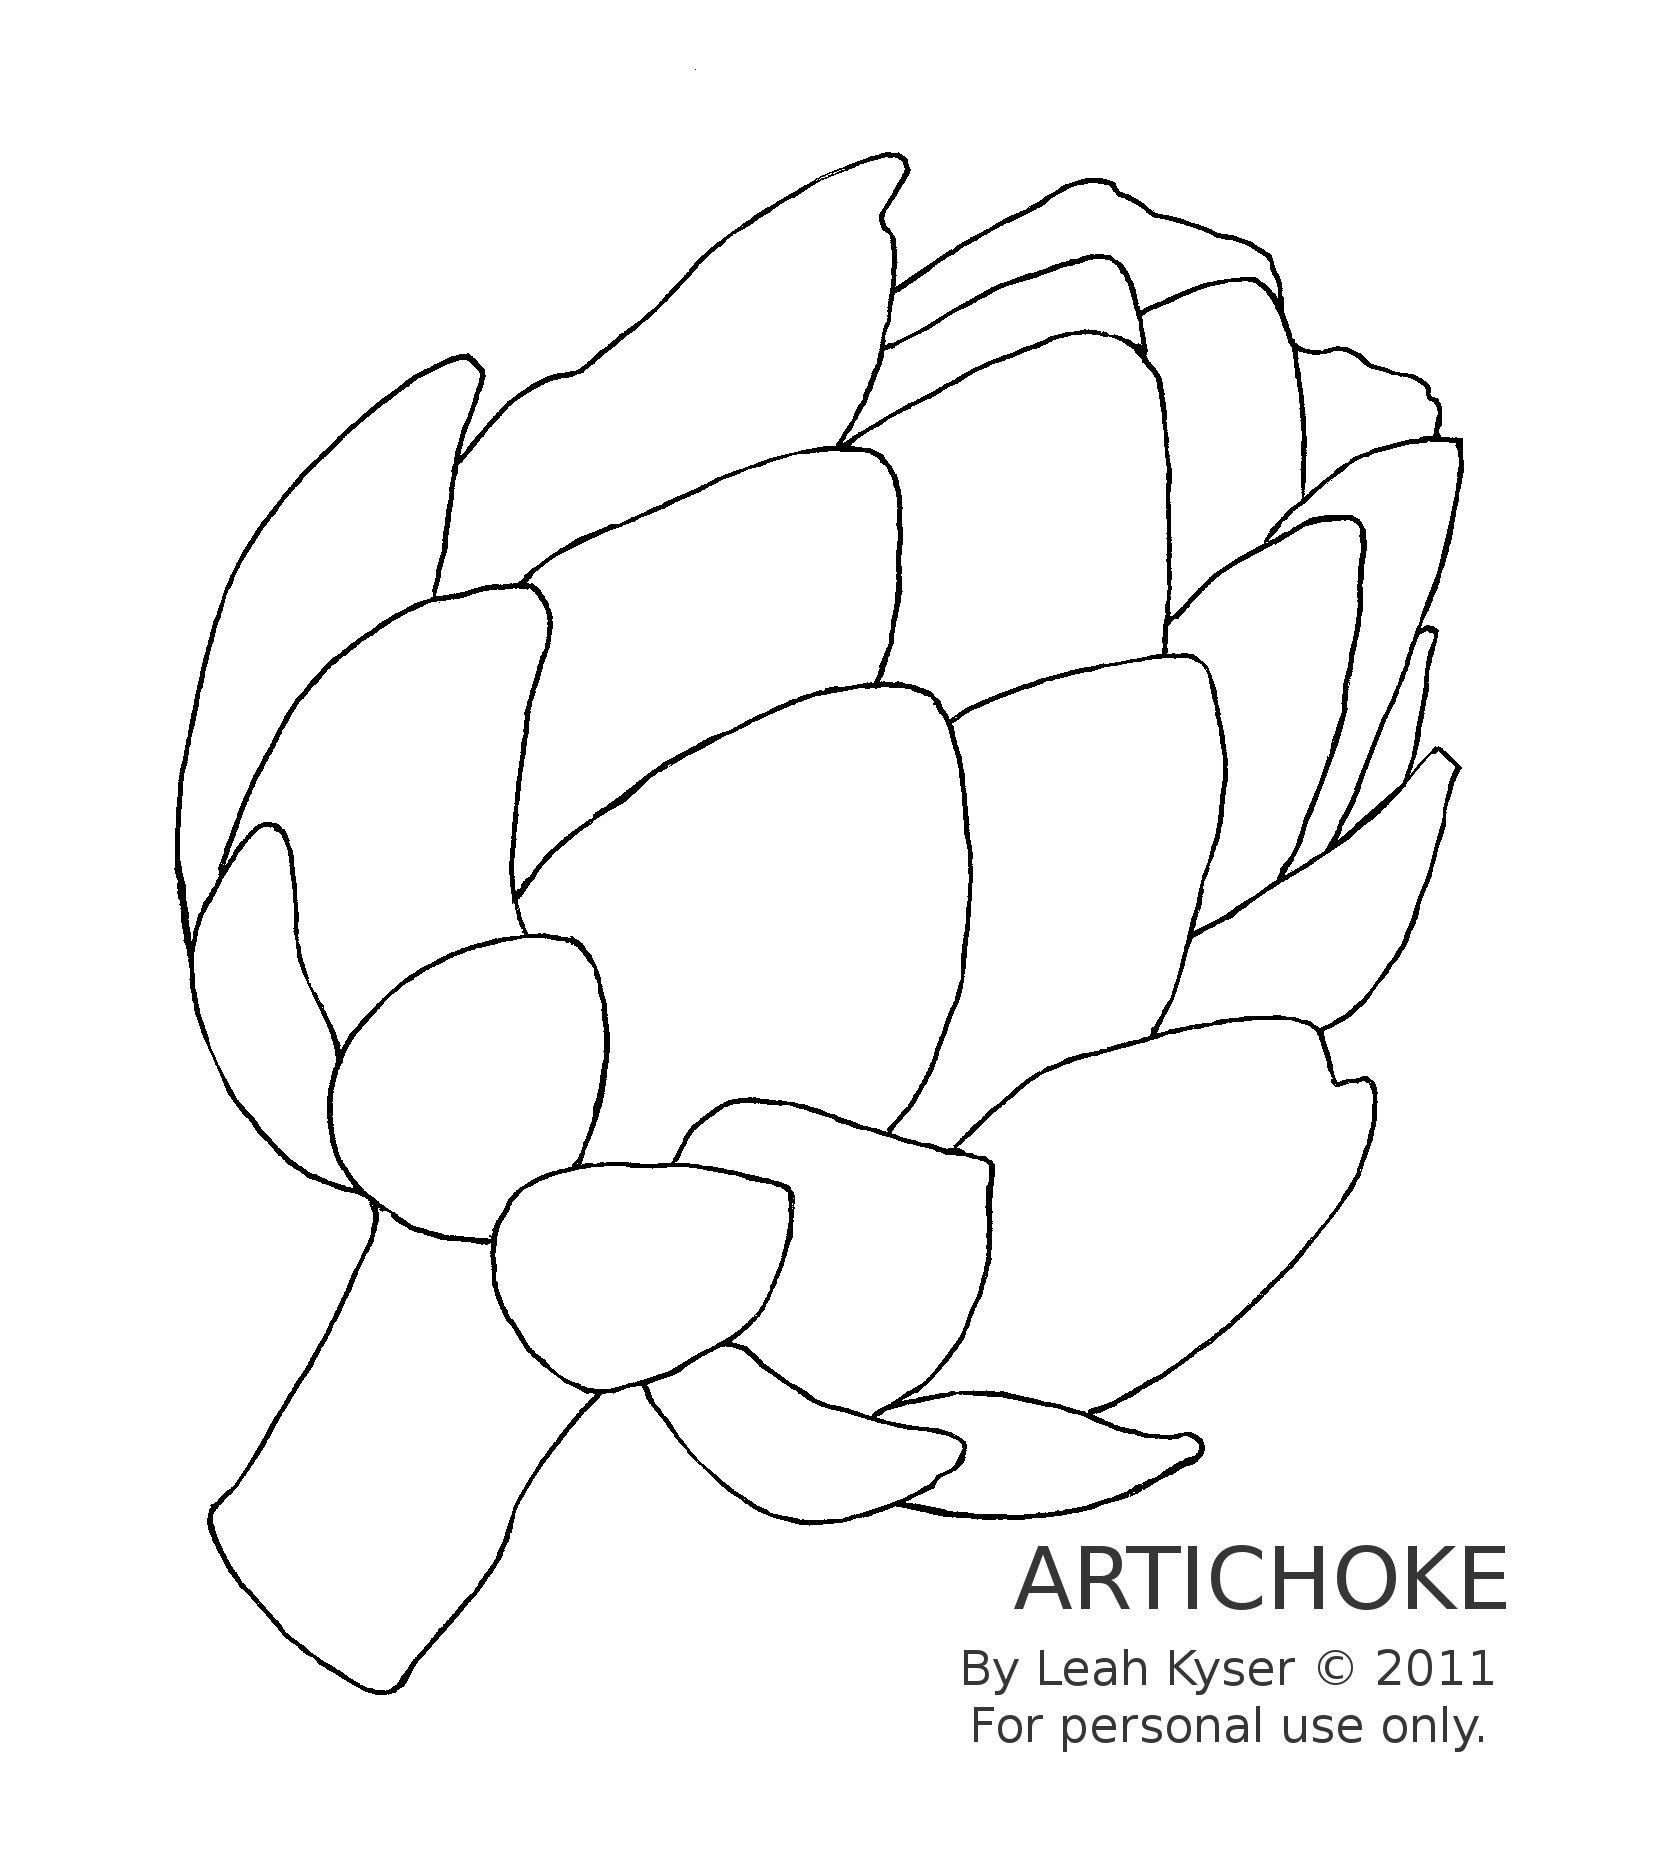 Artichoke embroidery design hand embroidery patterns free hand artichoke embroidery design bankloansurffo Gallery